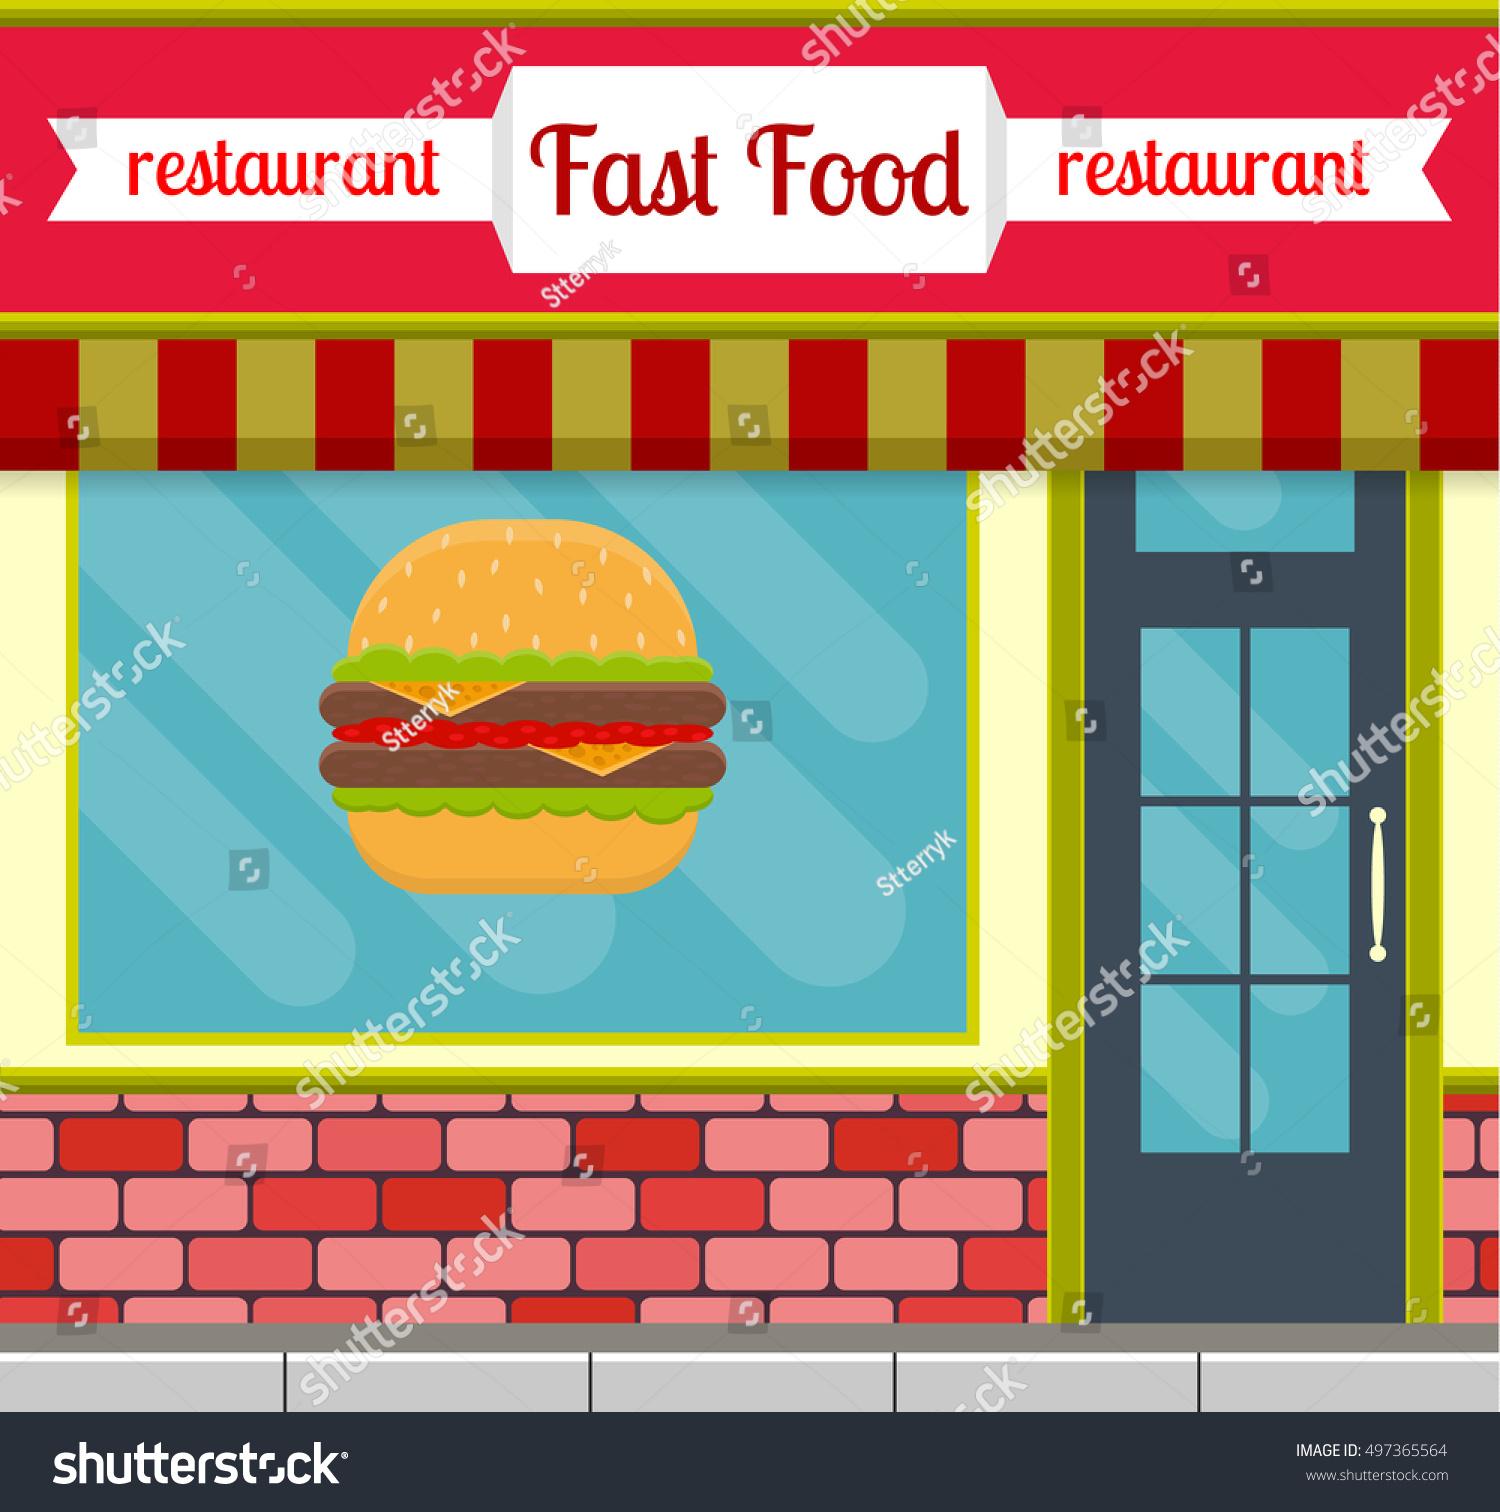 fast food restaurant facade flat style stock illustration 497365564 shutterstock. Black Bedroom Furniture Sets. Home Design Ideas